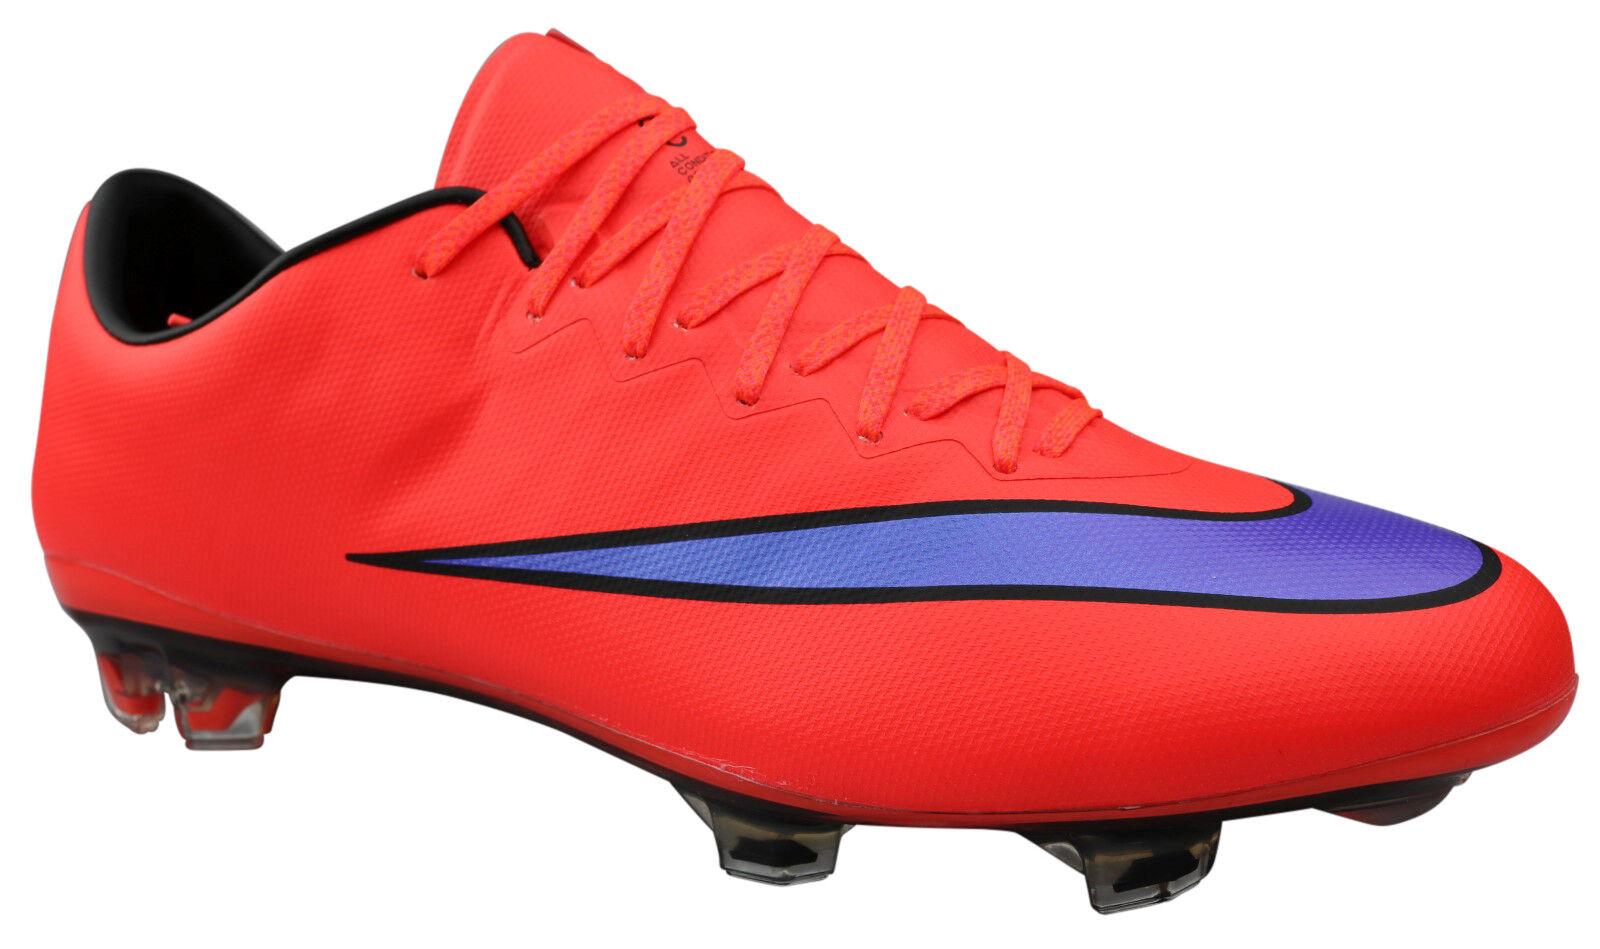 Nike Mercurial Vapor X FG Herren Fußballschuhe rot blau Gr 40,5 - 47 NEU & OVP